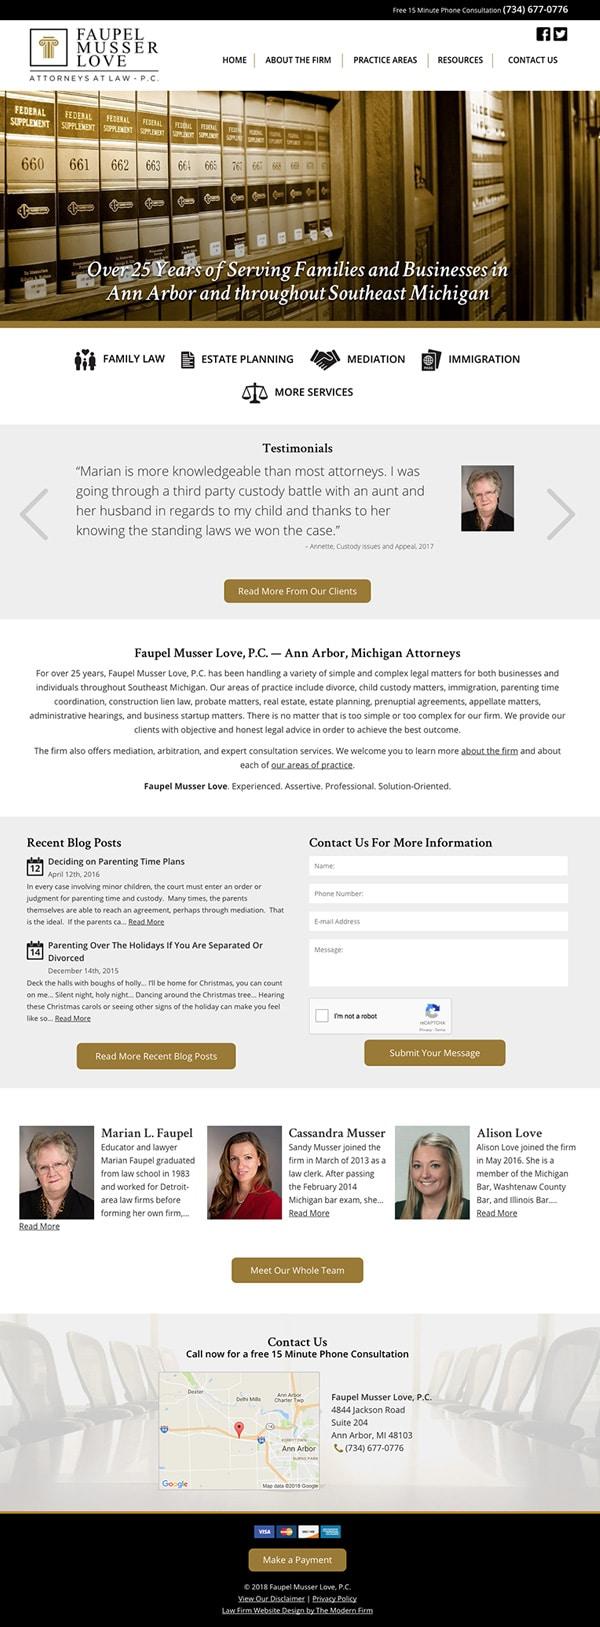 Law Firm Website Design for Faupel Musser Love, P.C.